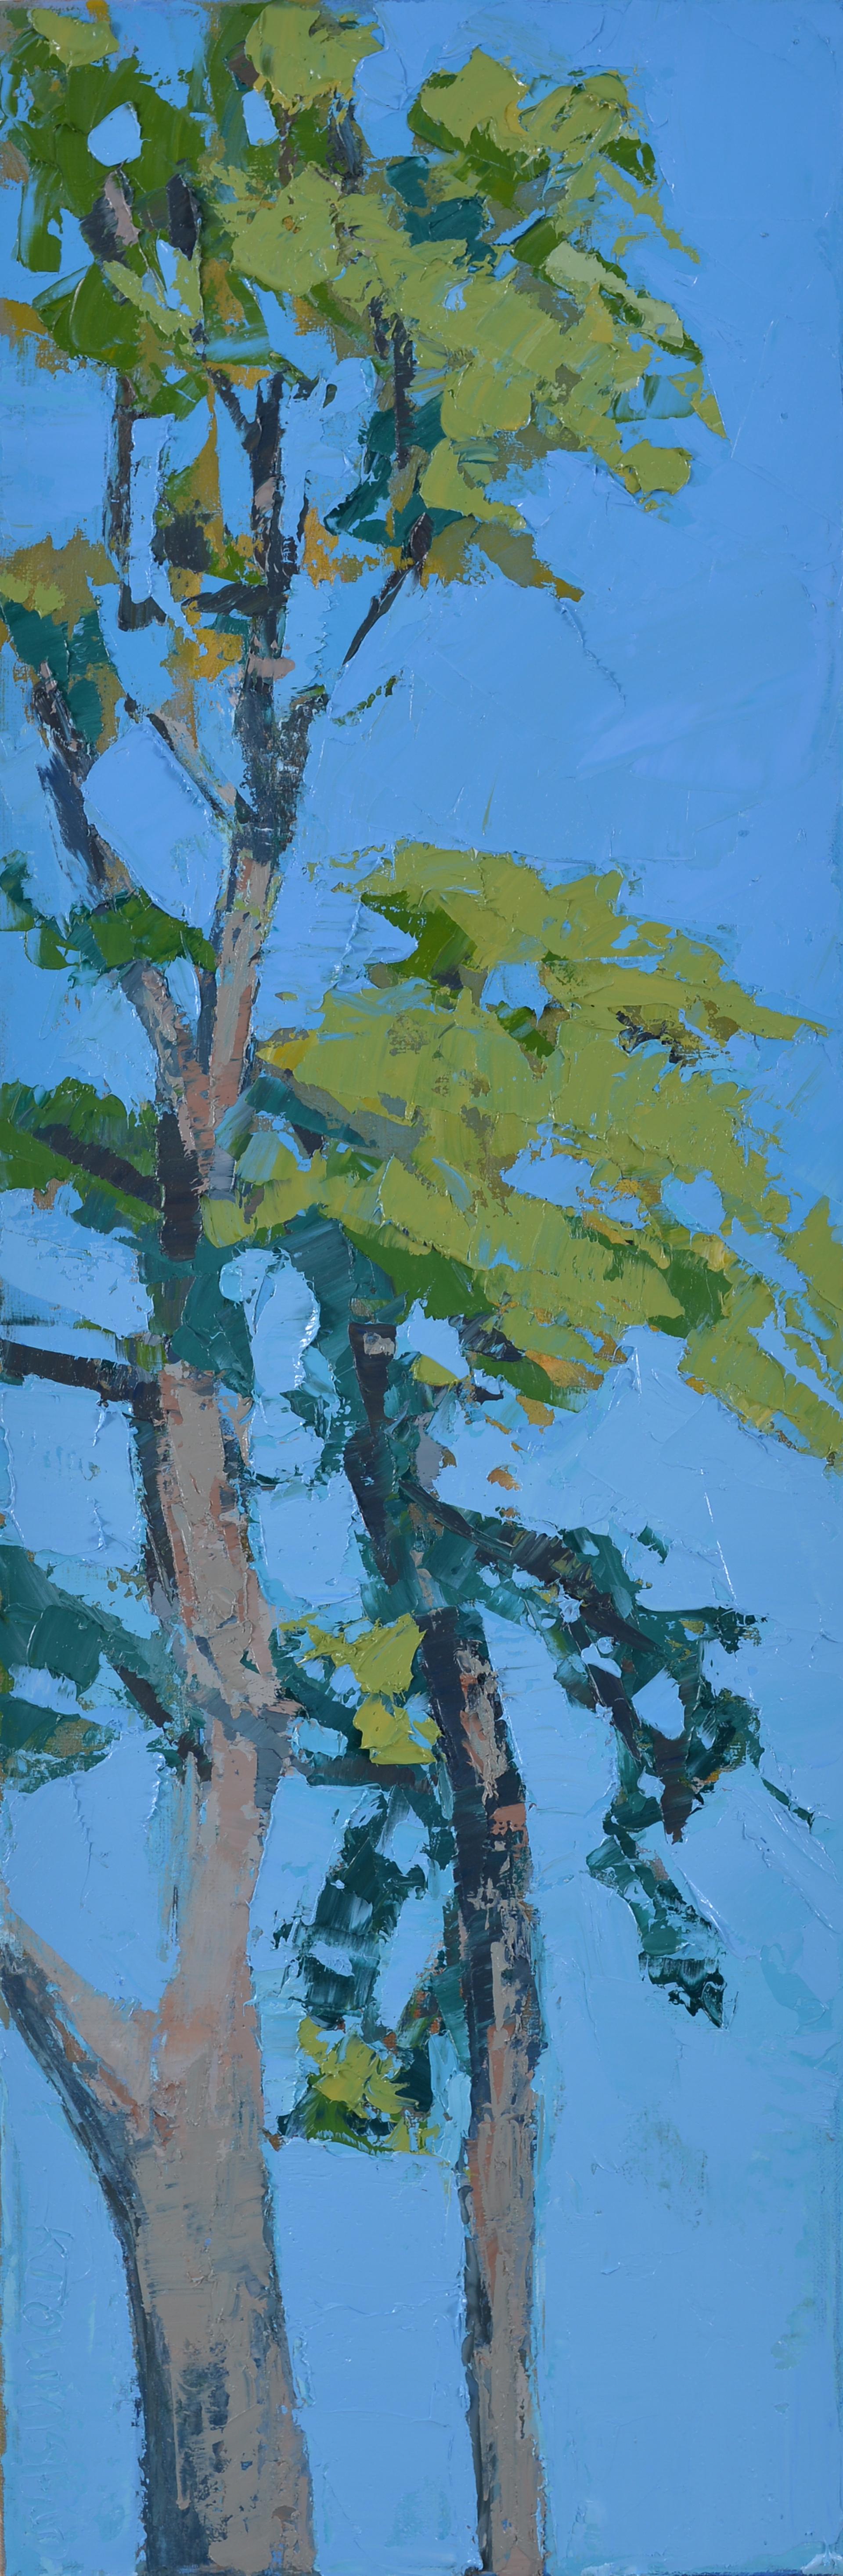 Cedars in the Wind by Krista Townsend